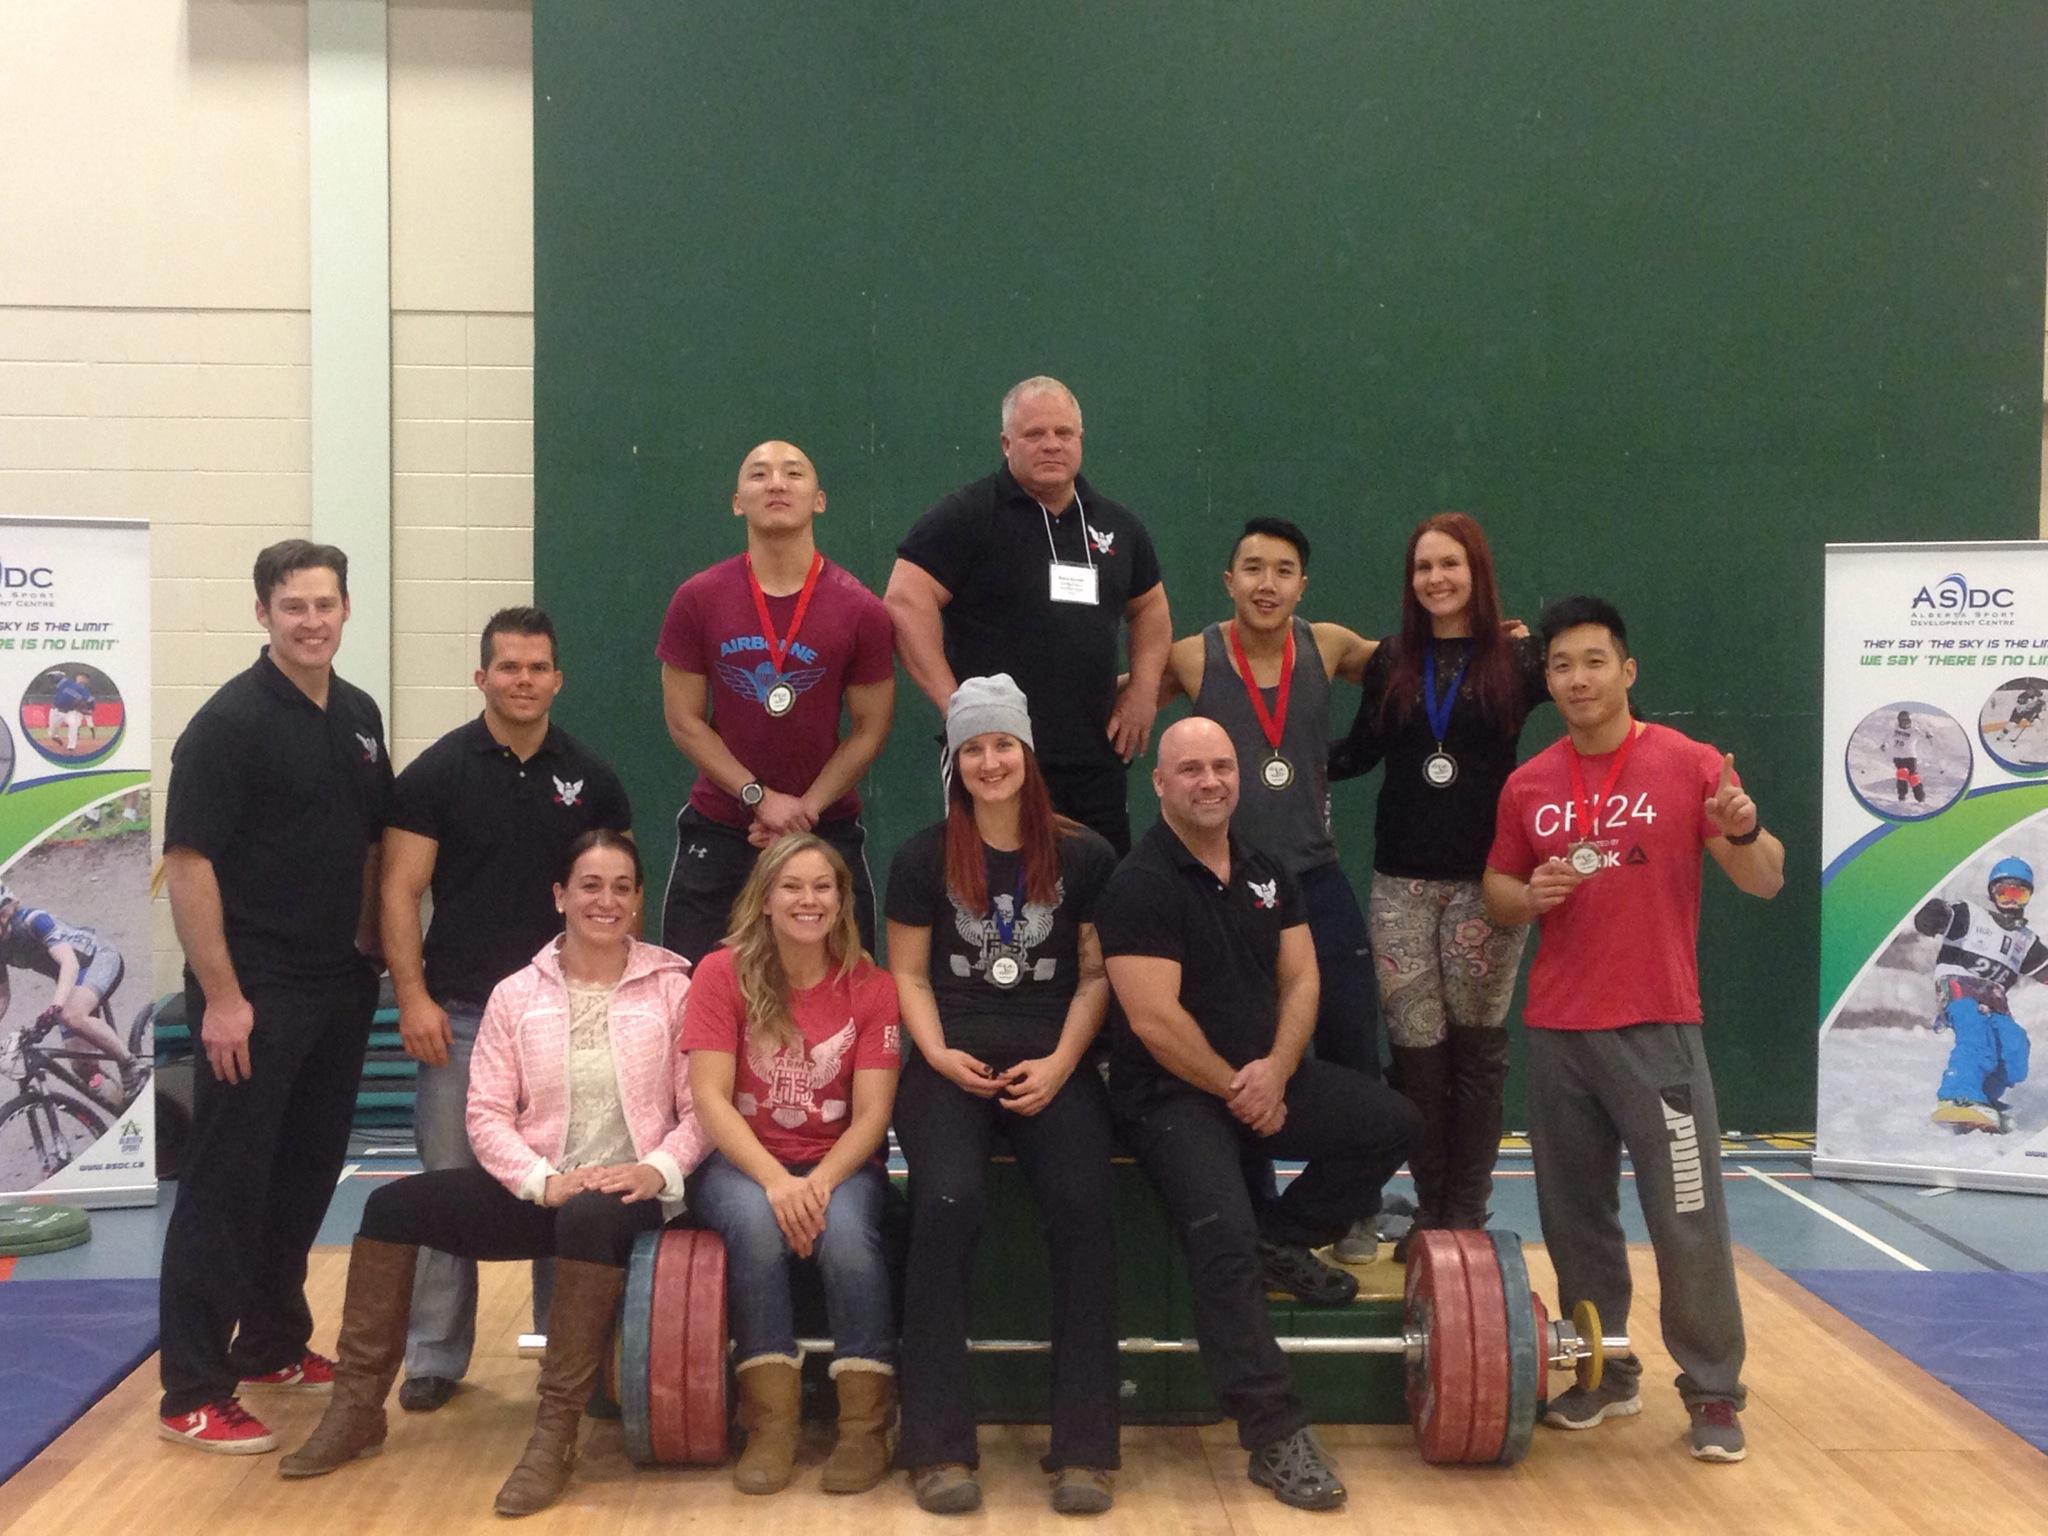 2014 Alberta Weightlifting Championship